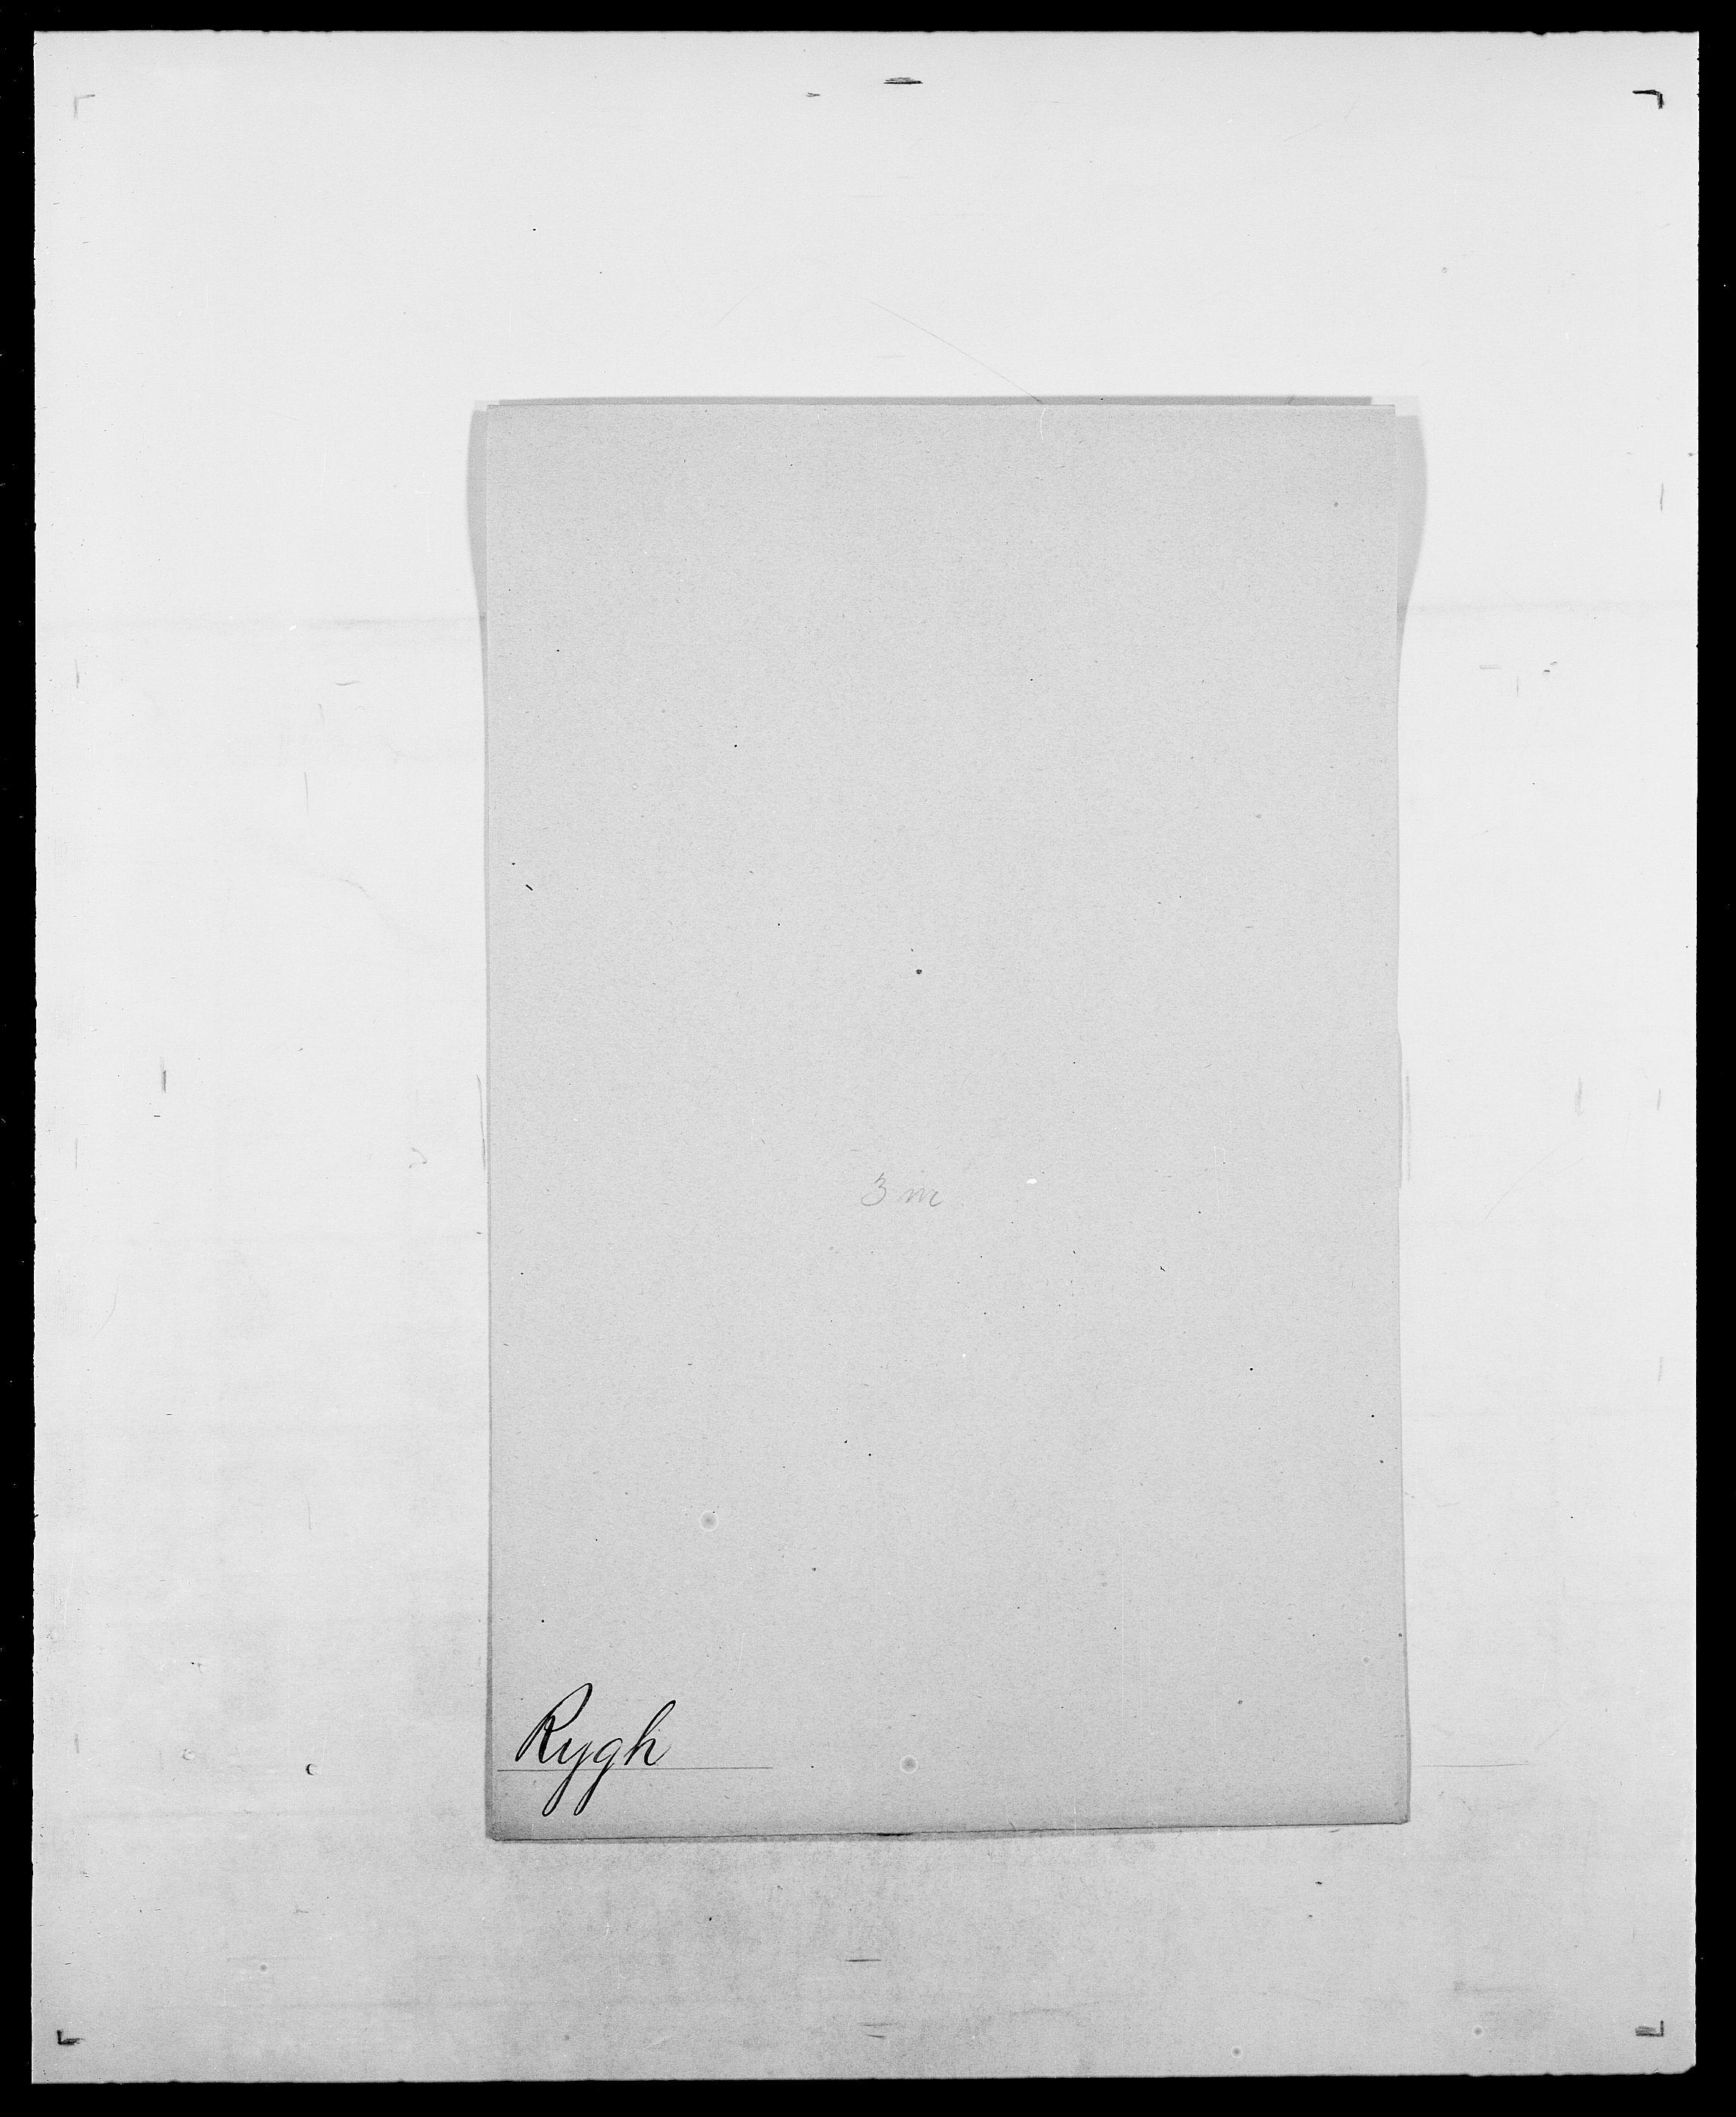 SAO, Delgobe, Charles Antoine - samling, D/Da/L0033: Roald - Røyem, s. 559